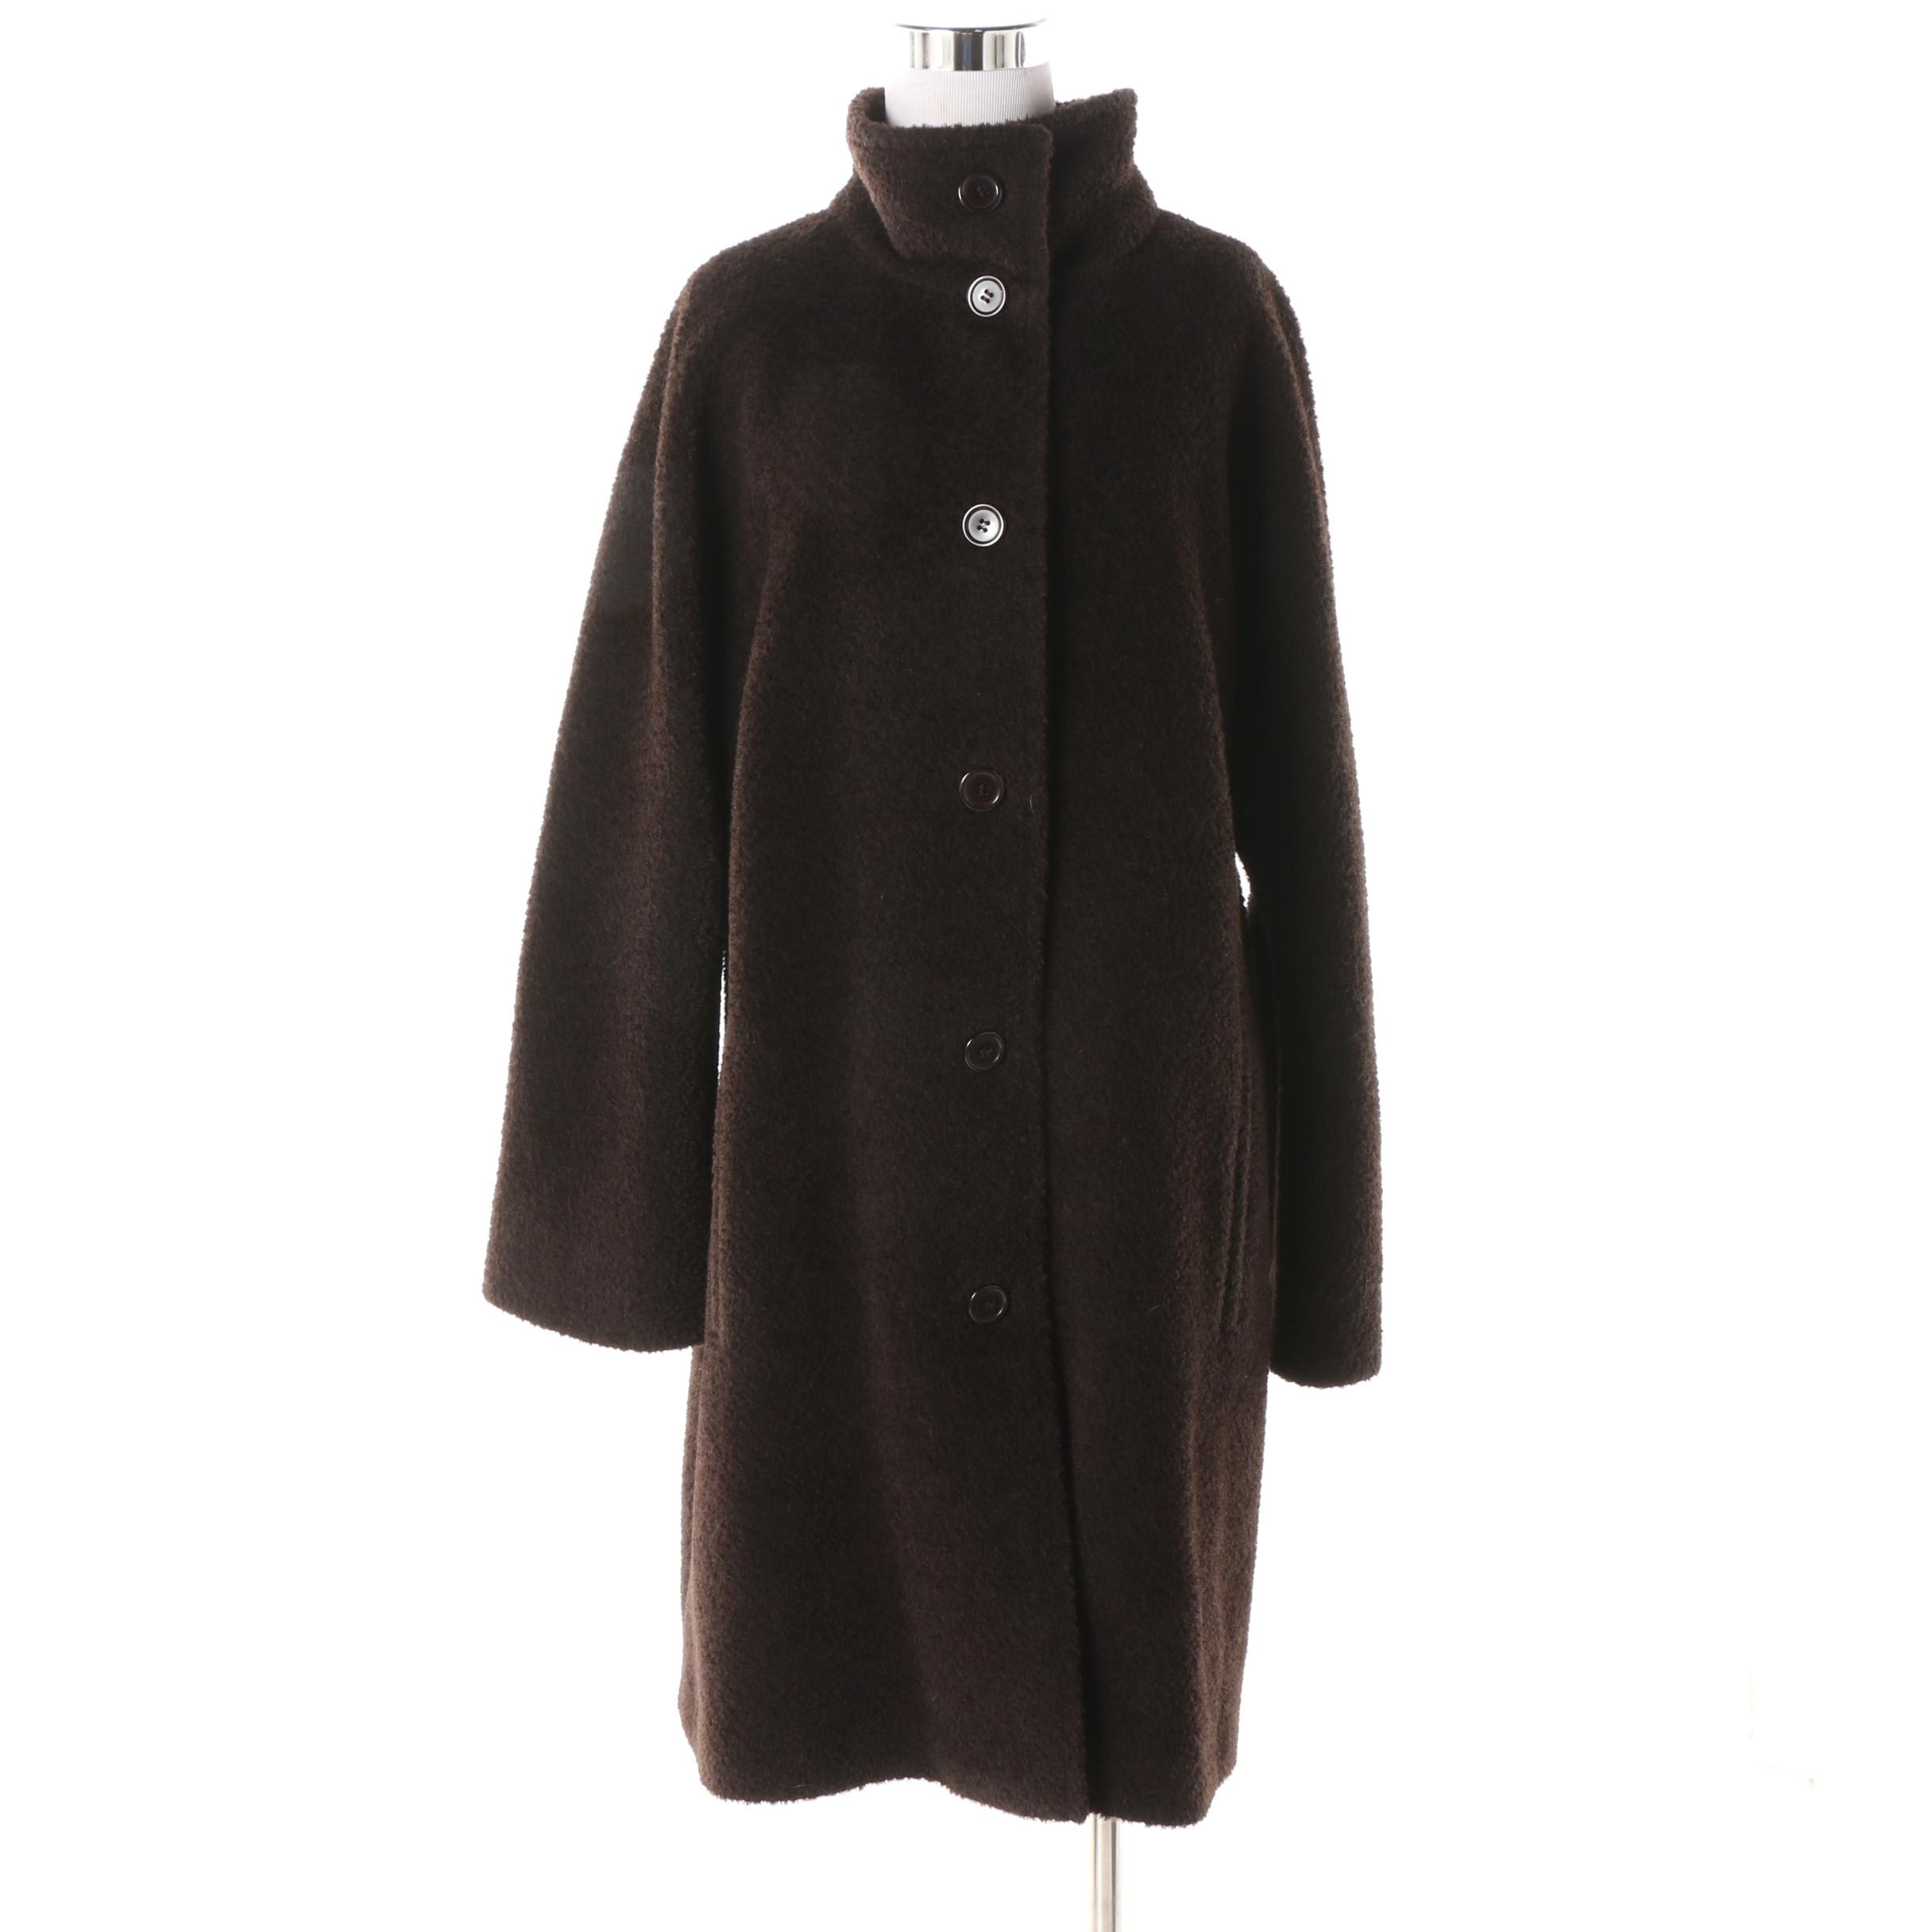 Women's Hilary Radley Dark Brown Alpaca Suri Wool Blend Coat